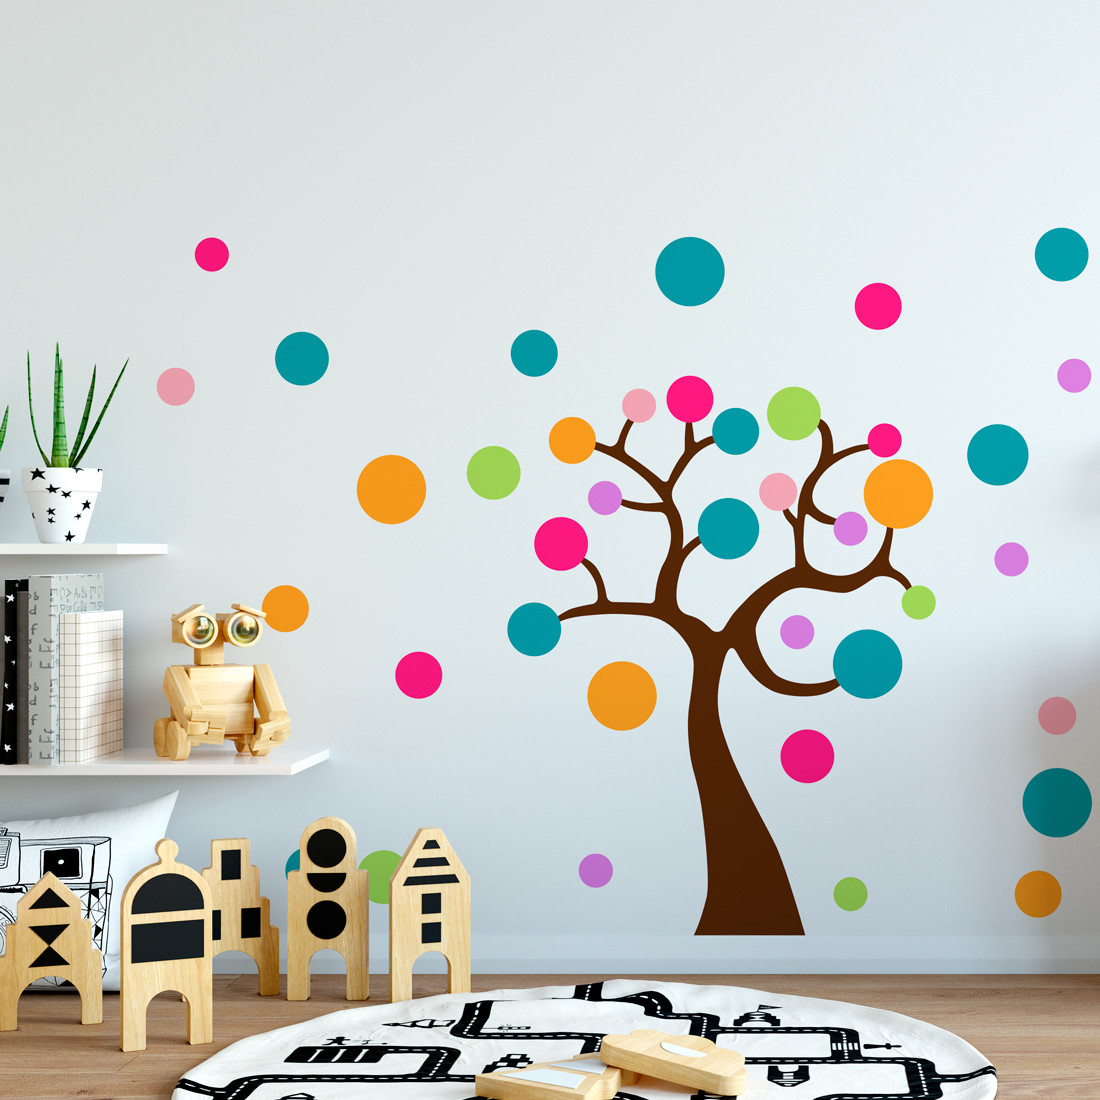 Adesivo de Parede Infantil Árvore de Bolas Coloridas